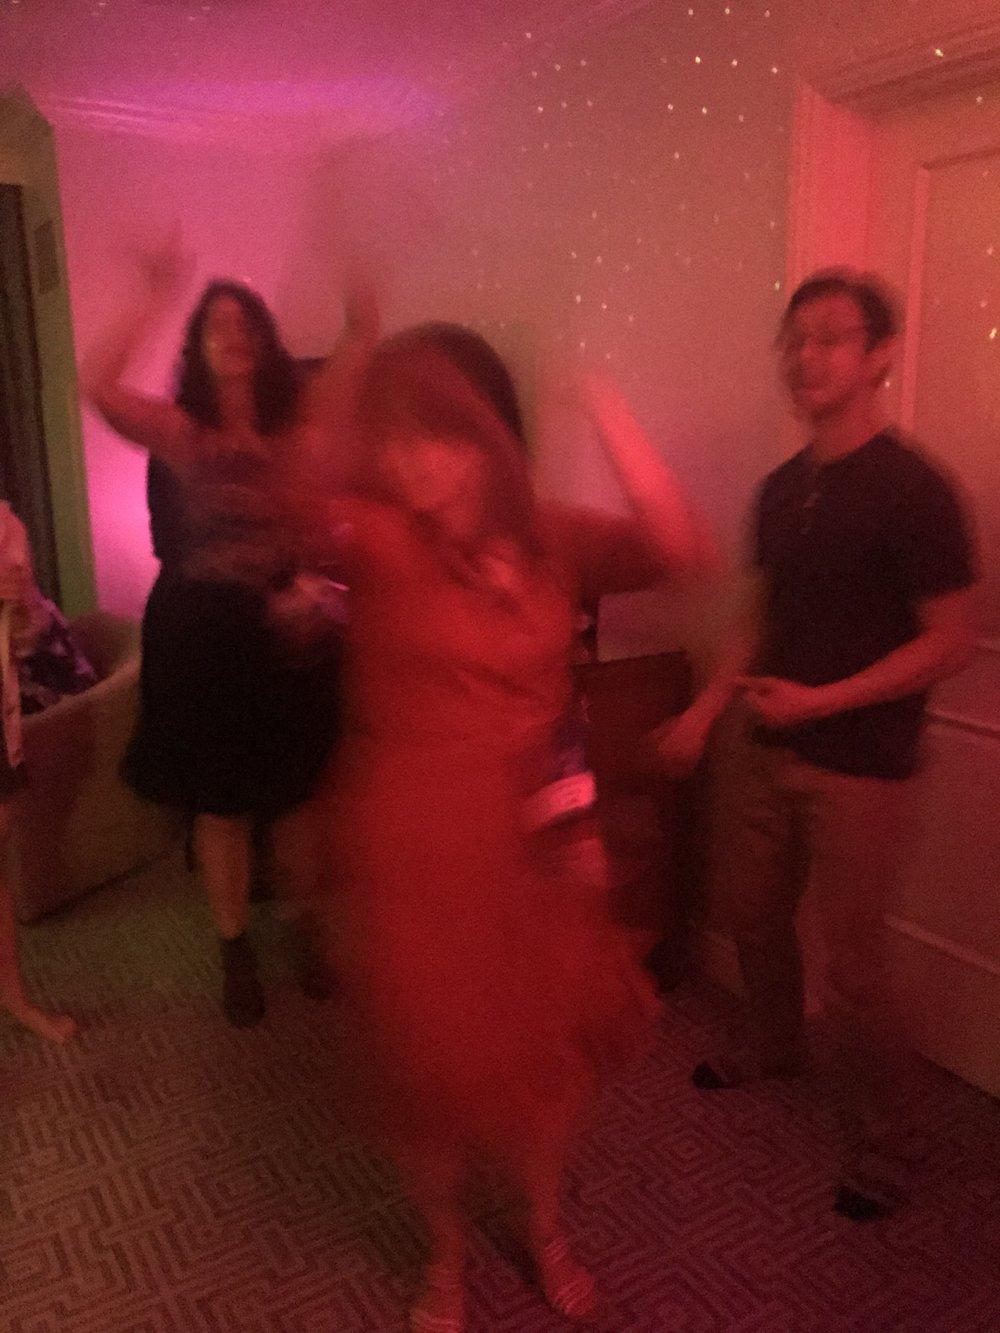 Blurry partiers: Gerardo Horacio Porcayo, Patty Garcia, Kirtana Rex, Héctor Gonzalez, Gabriela Damián, Libia Brinda, and Adrea Chapela at the Locus party on Saturday night at Worldcon 76